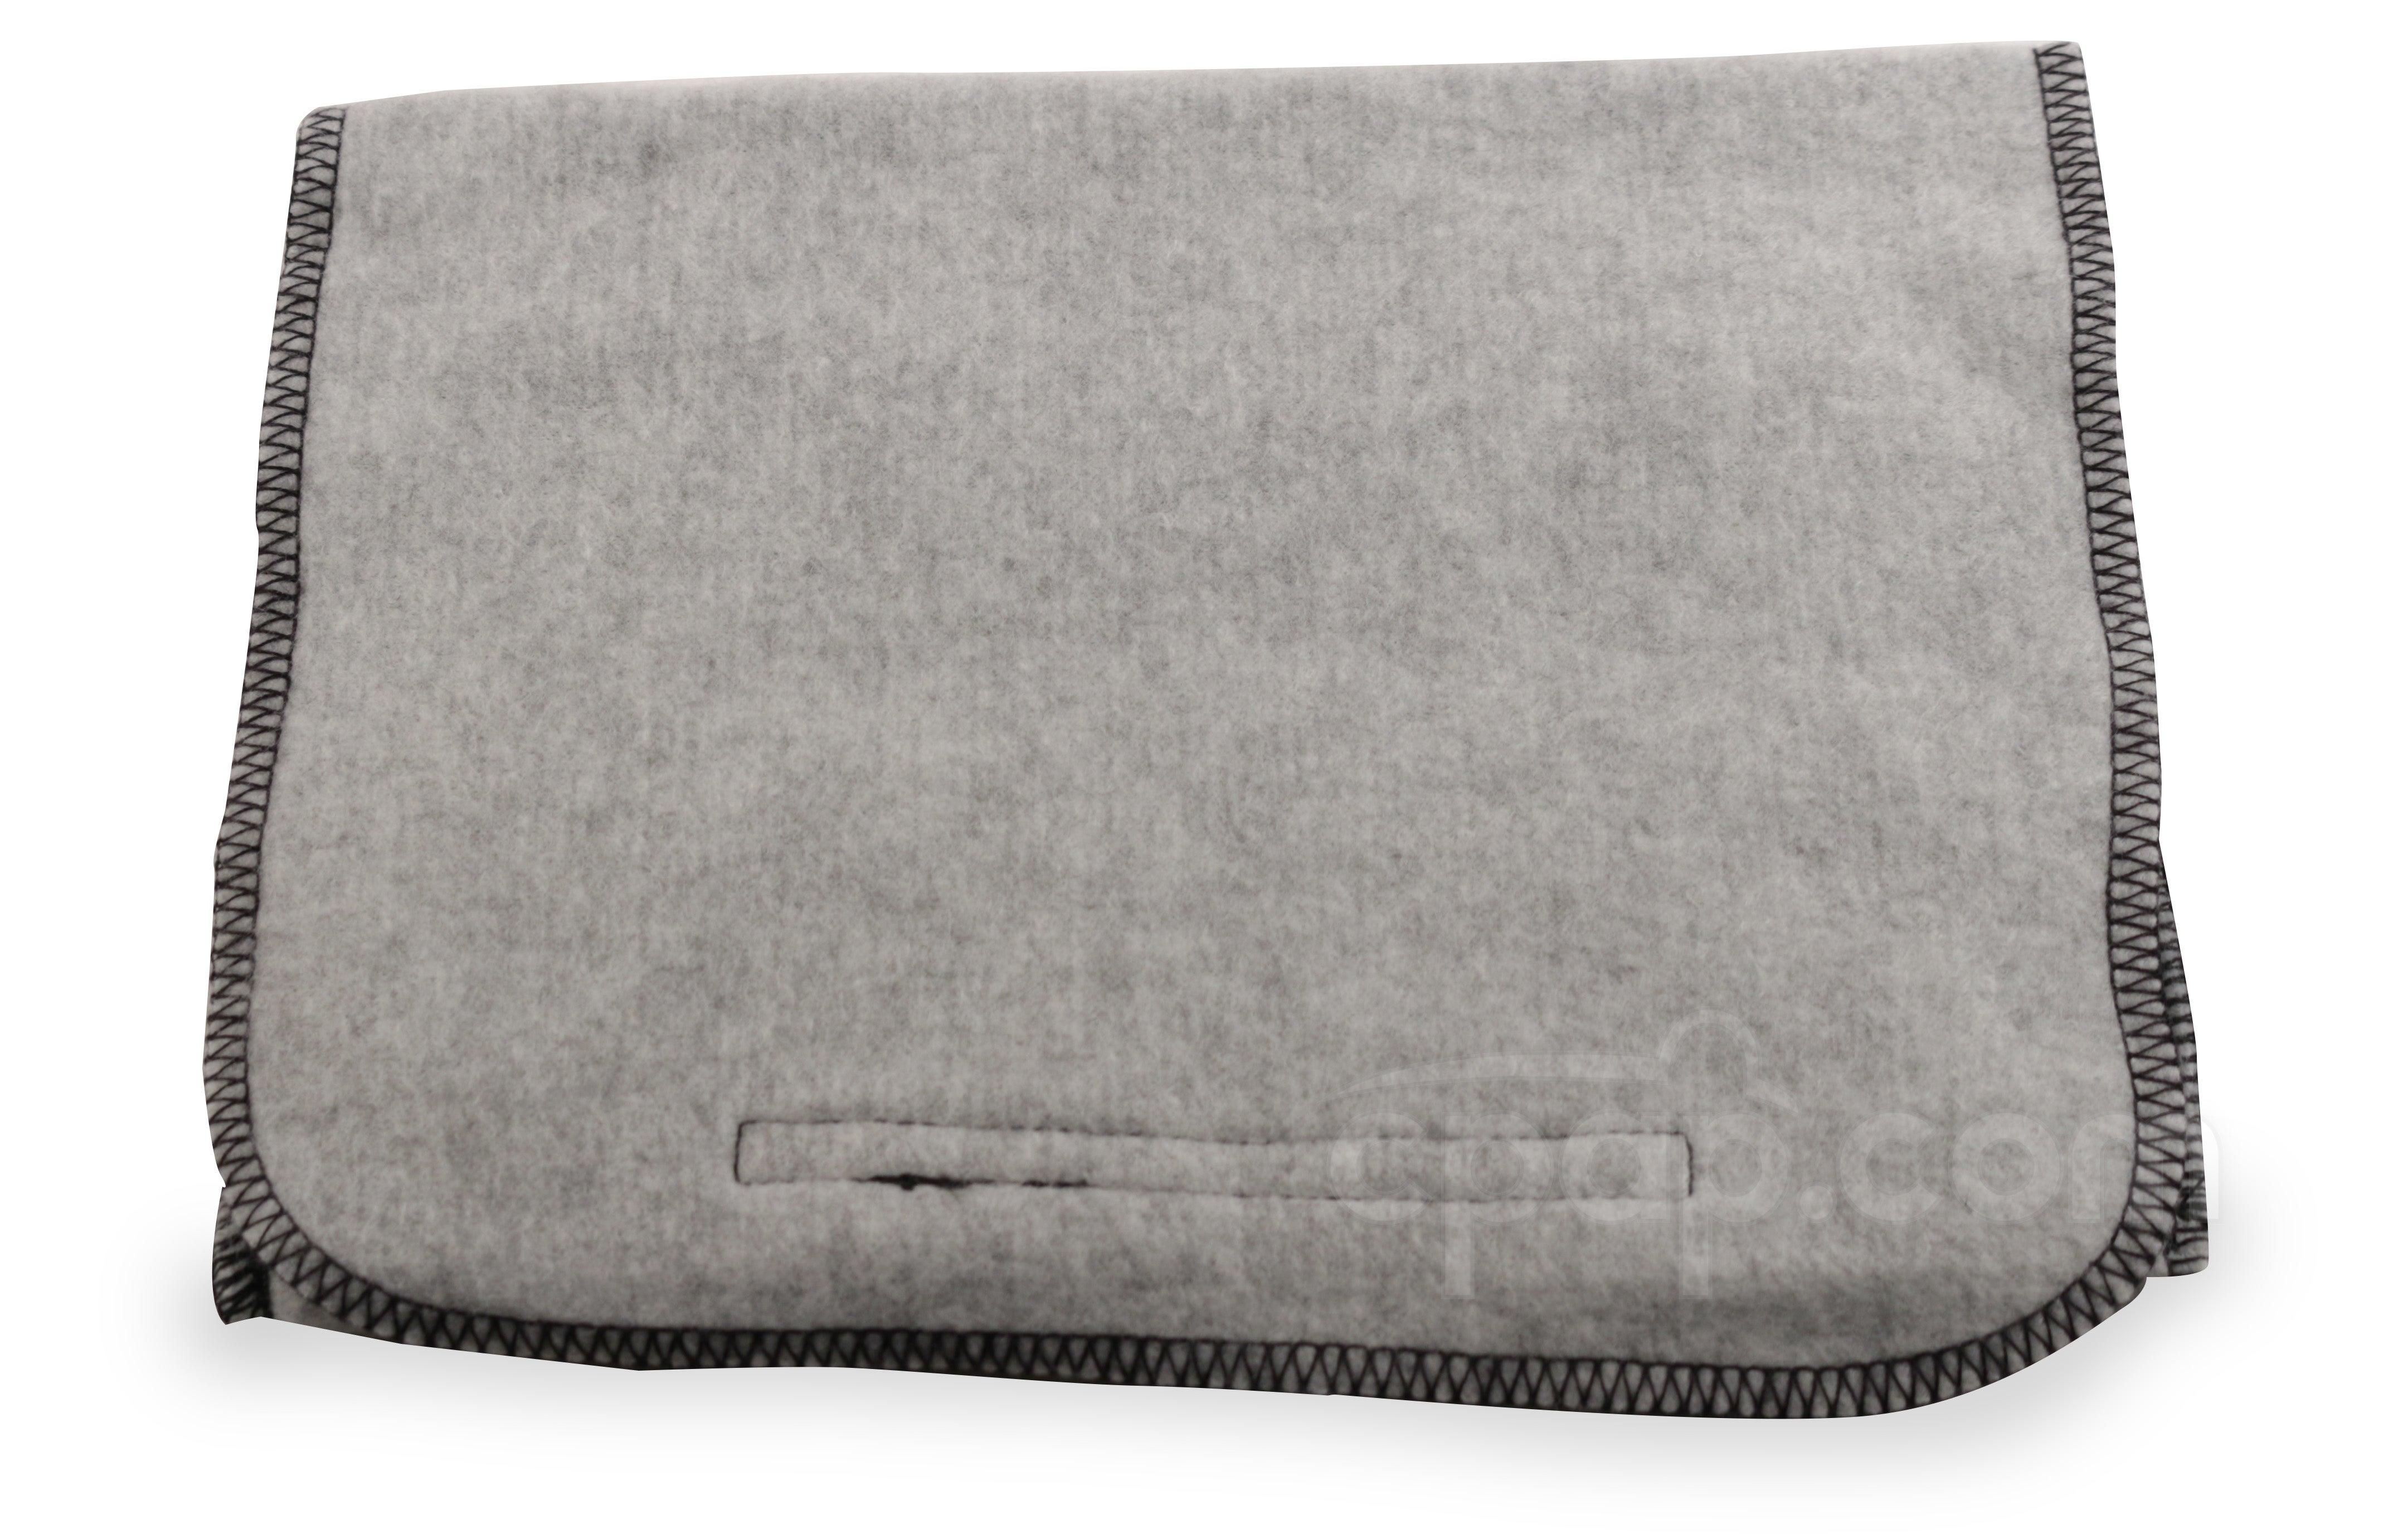 PurSleep System Travel Bag - Folded